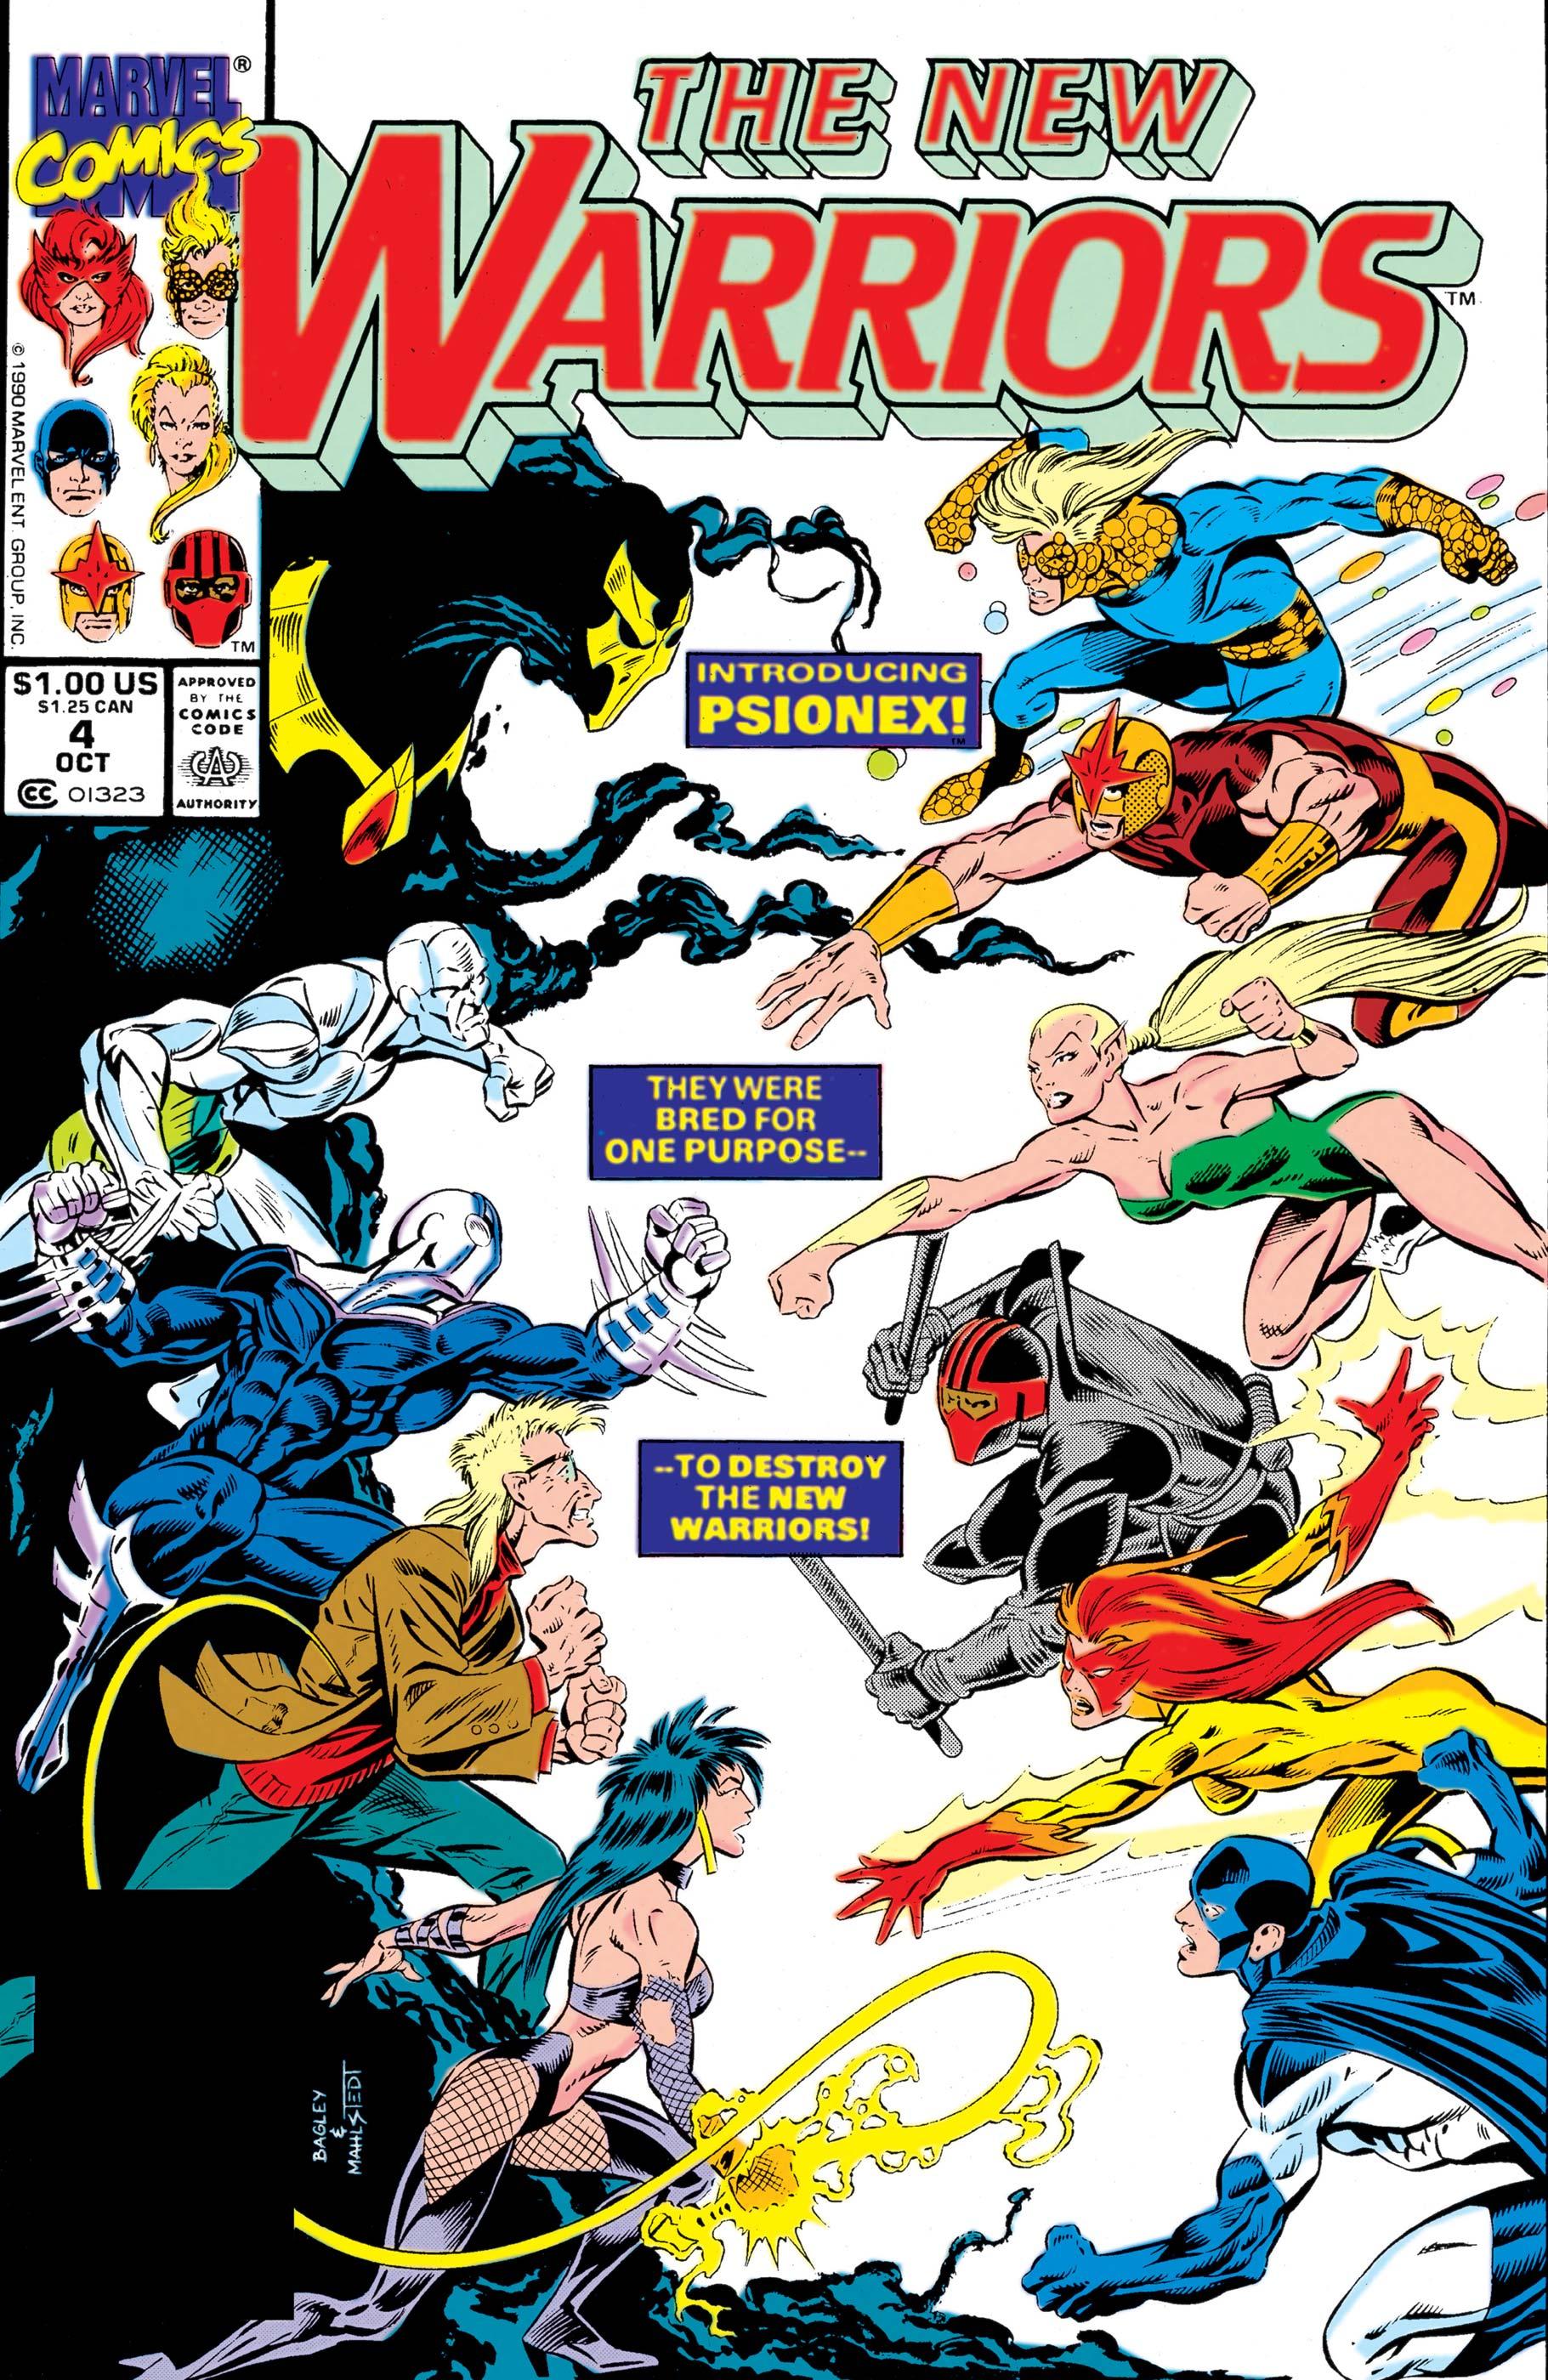 New Warriors (1990) #4